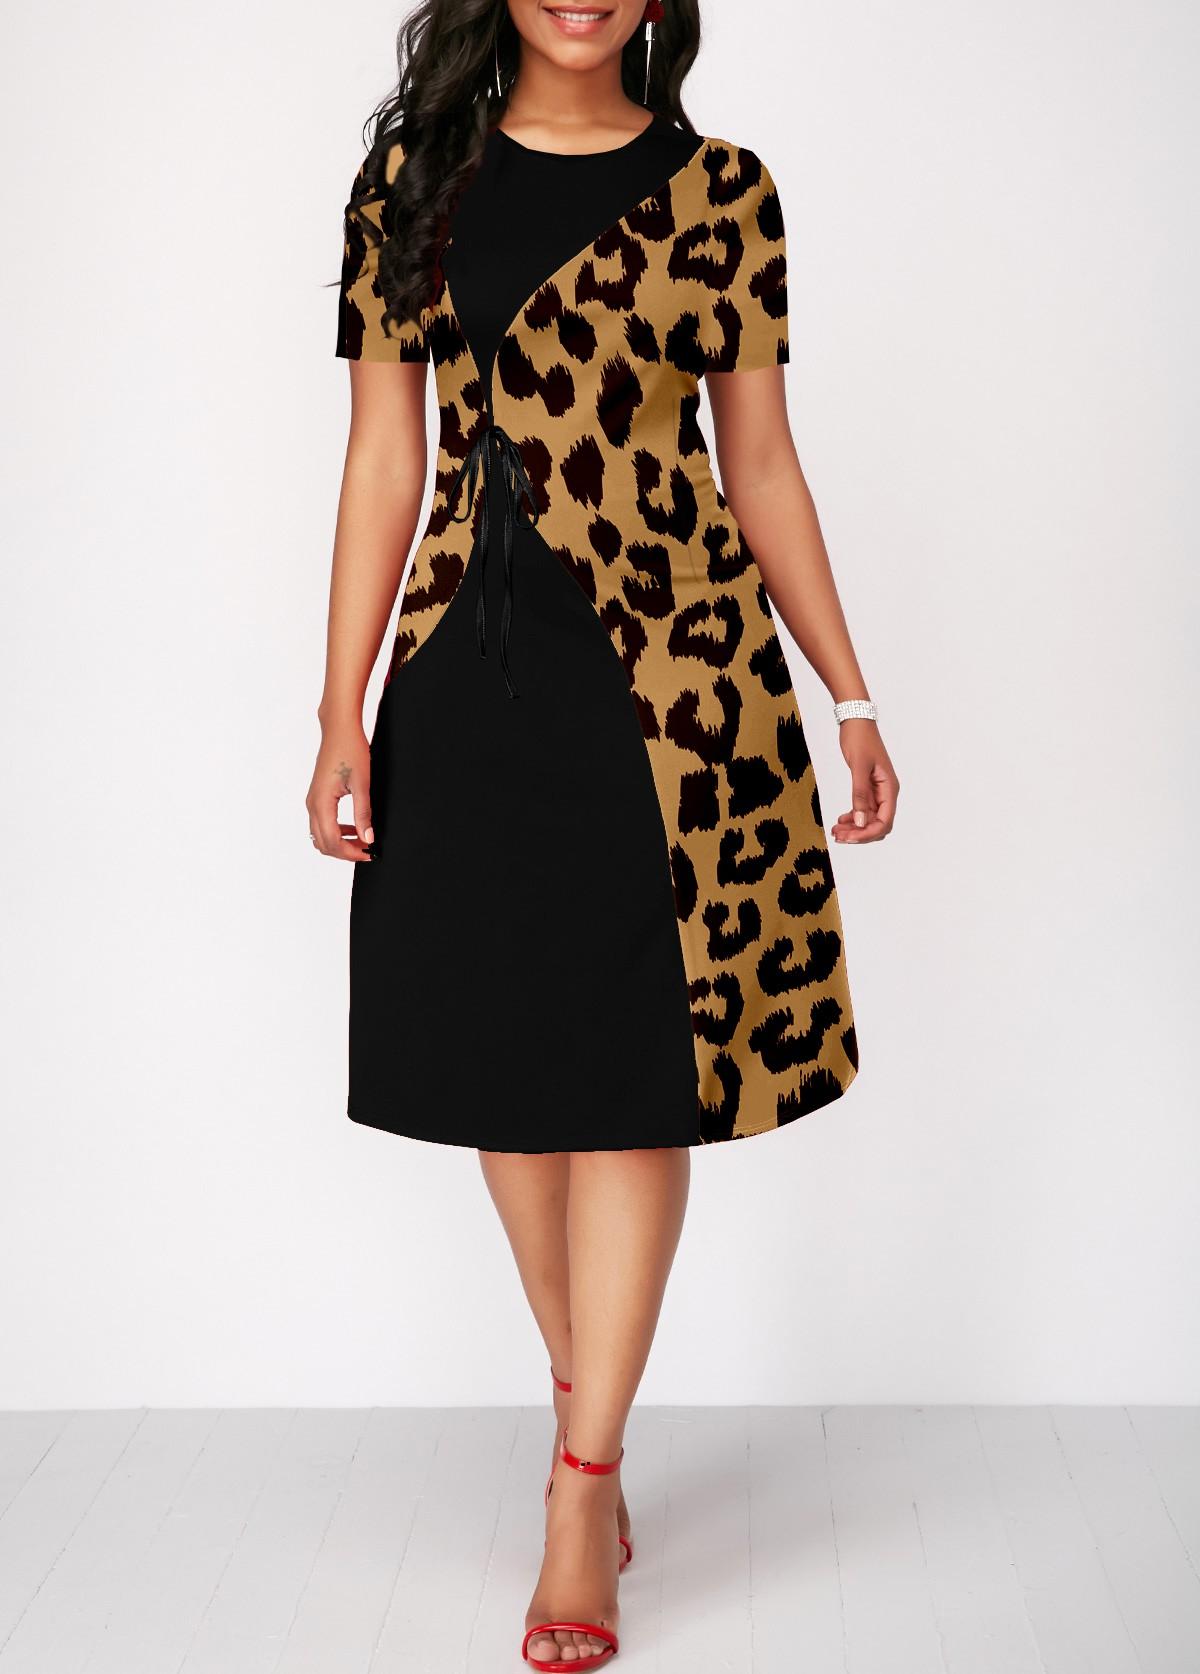 ROTITA Leopard Round Neck Short Sleeve Dress